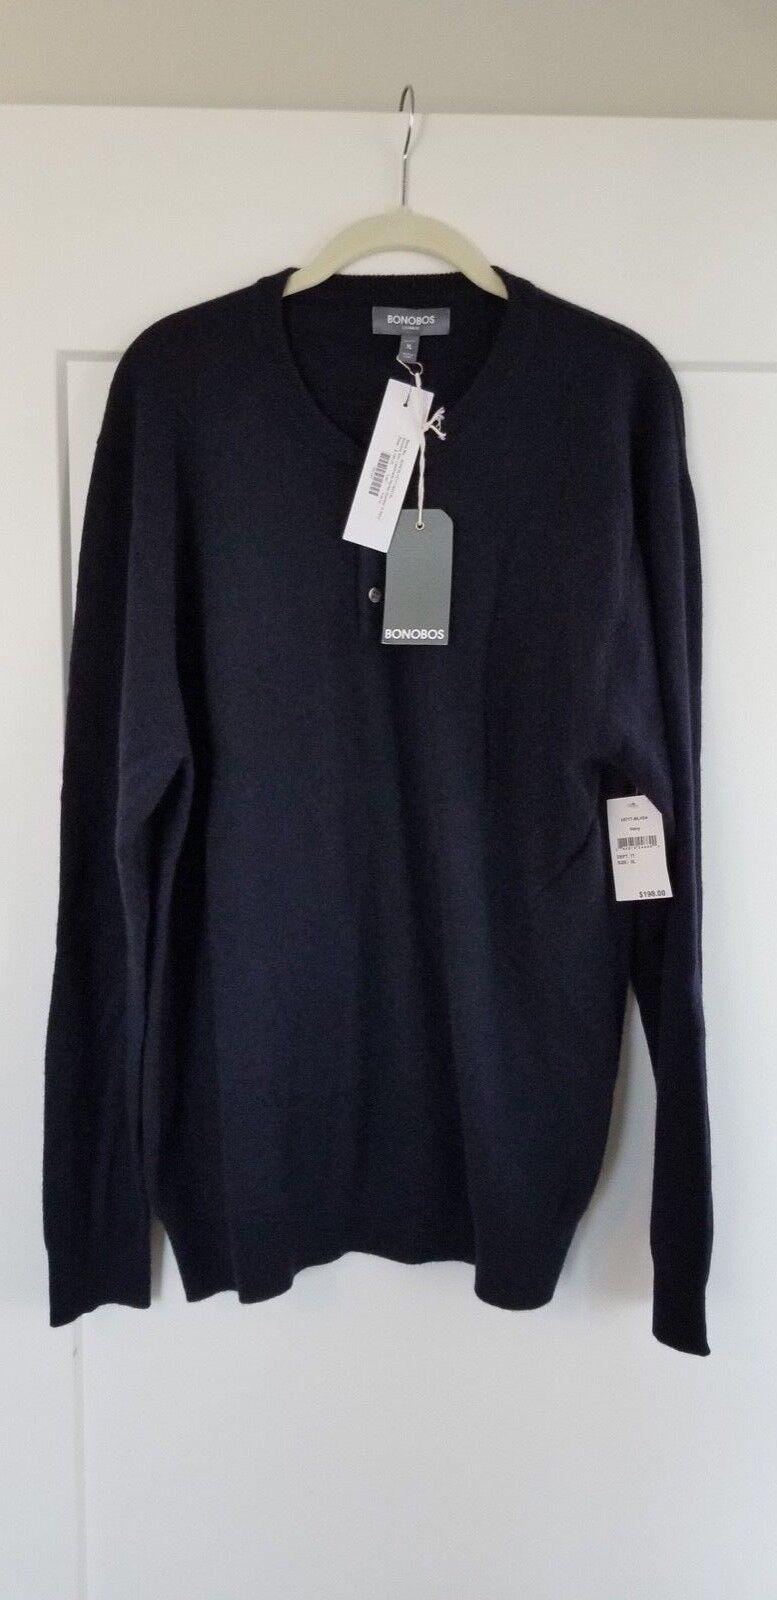 Mens Bonobos Henley Cashmere Sweater Size XL Navy